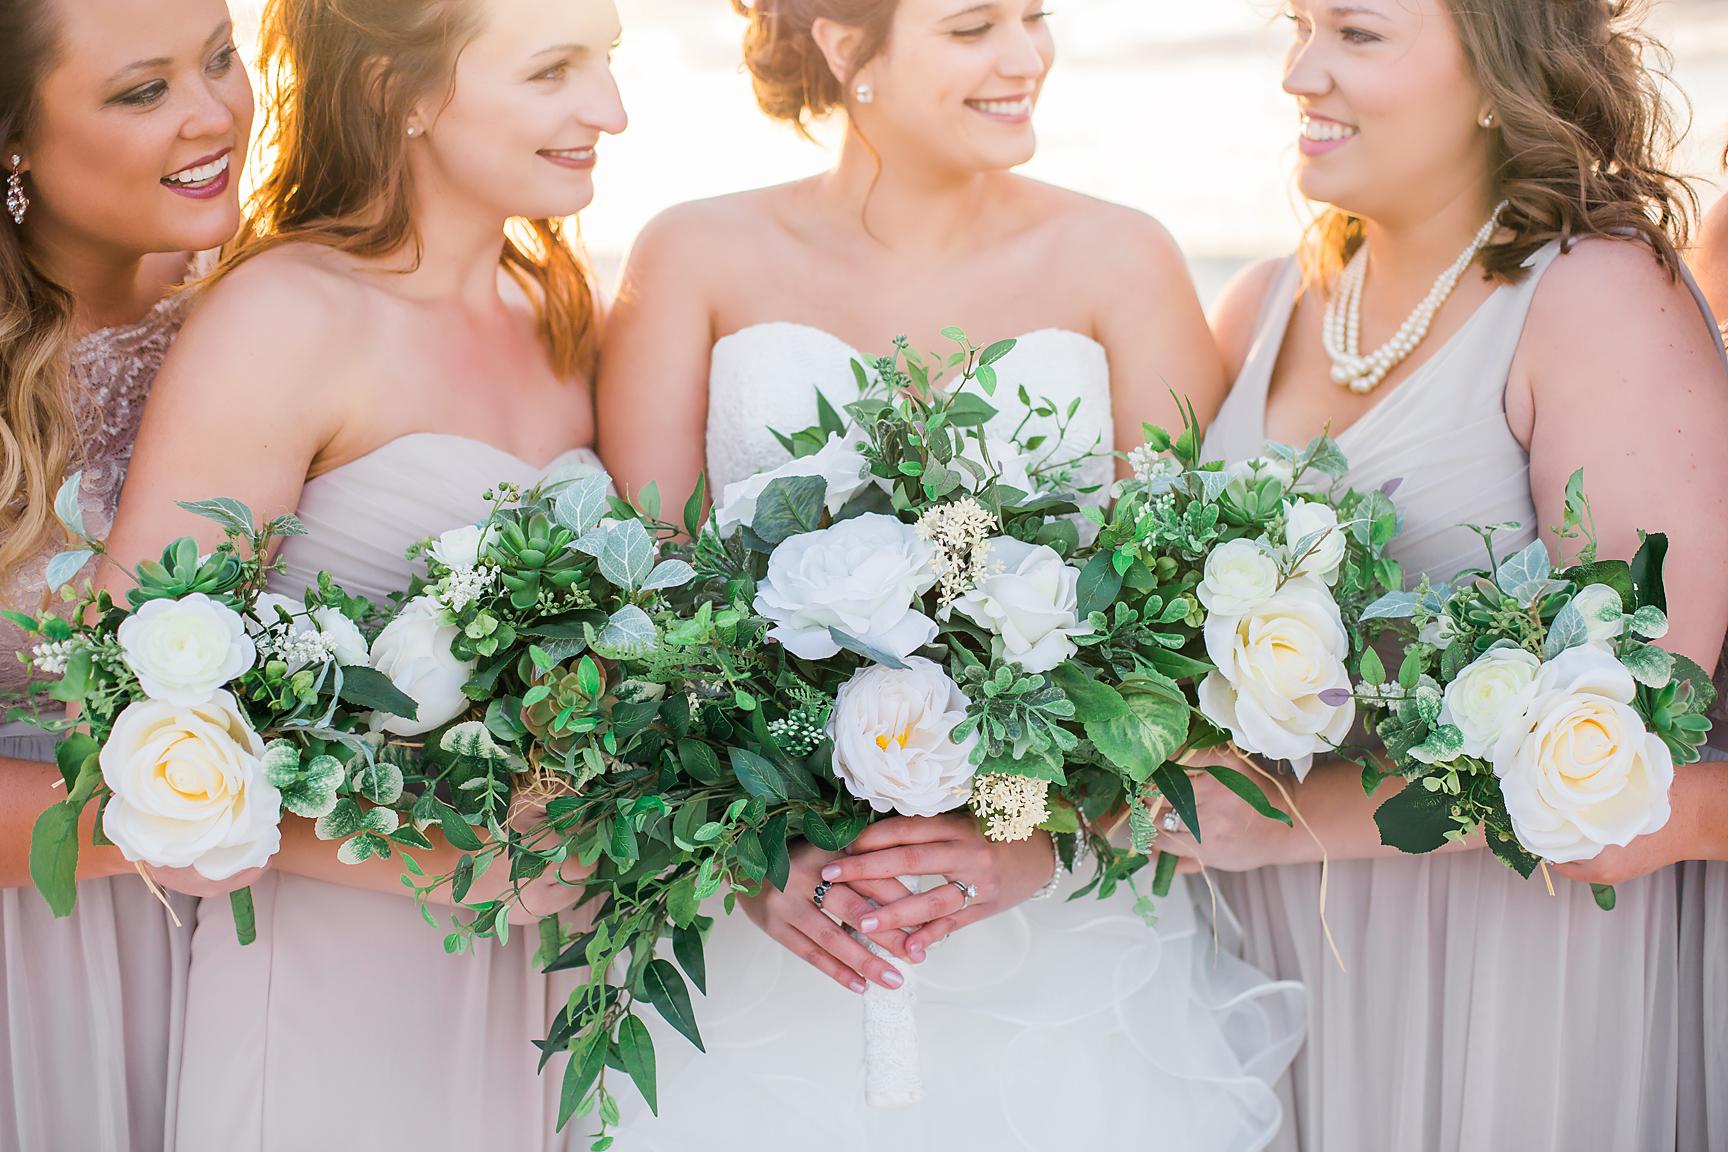 Bailey + Chalin - Anna Maria Island Wedding Photographer - Destination Wedding Photography - Emily & Co. Photography - Beach Wedding Photography 3.jpg